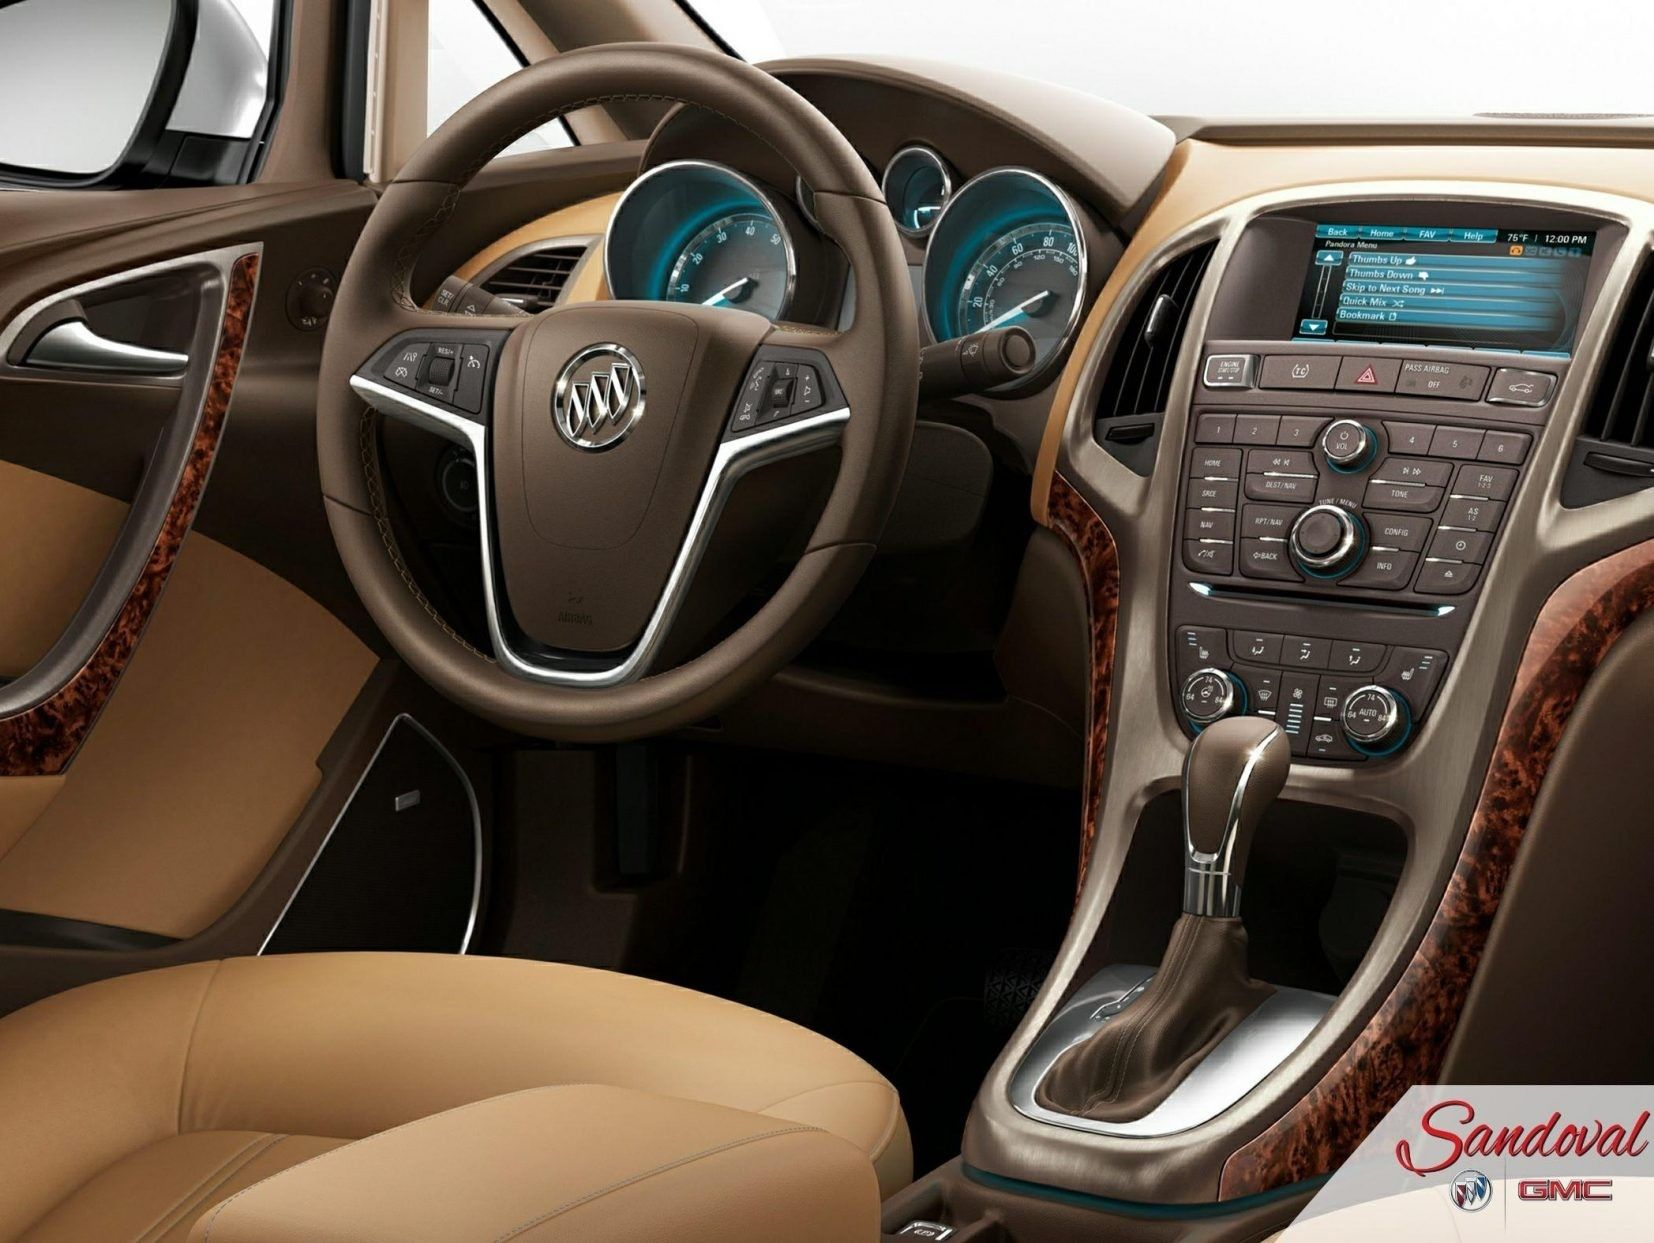 All 2019 Buick Verano Exterior And Interior Review Buick Verano Buick Enclave Buick